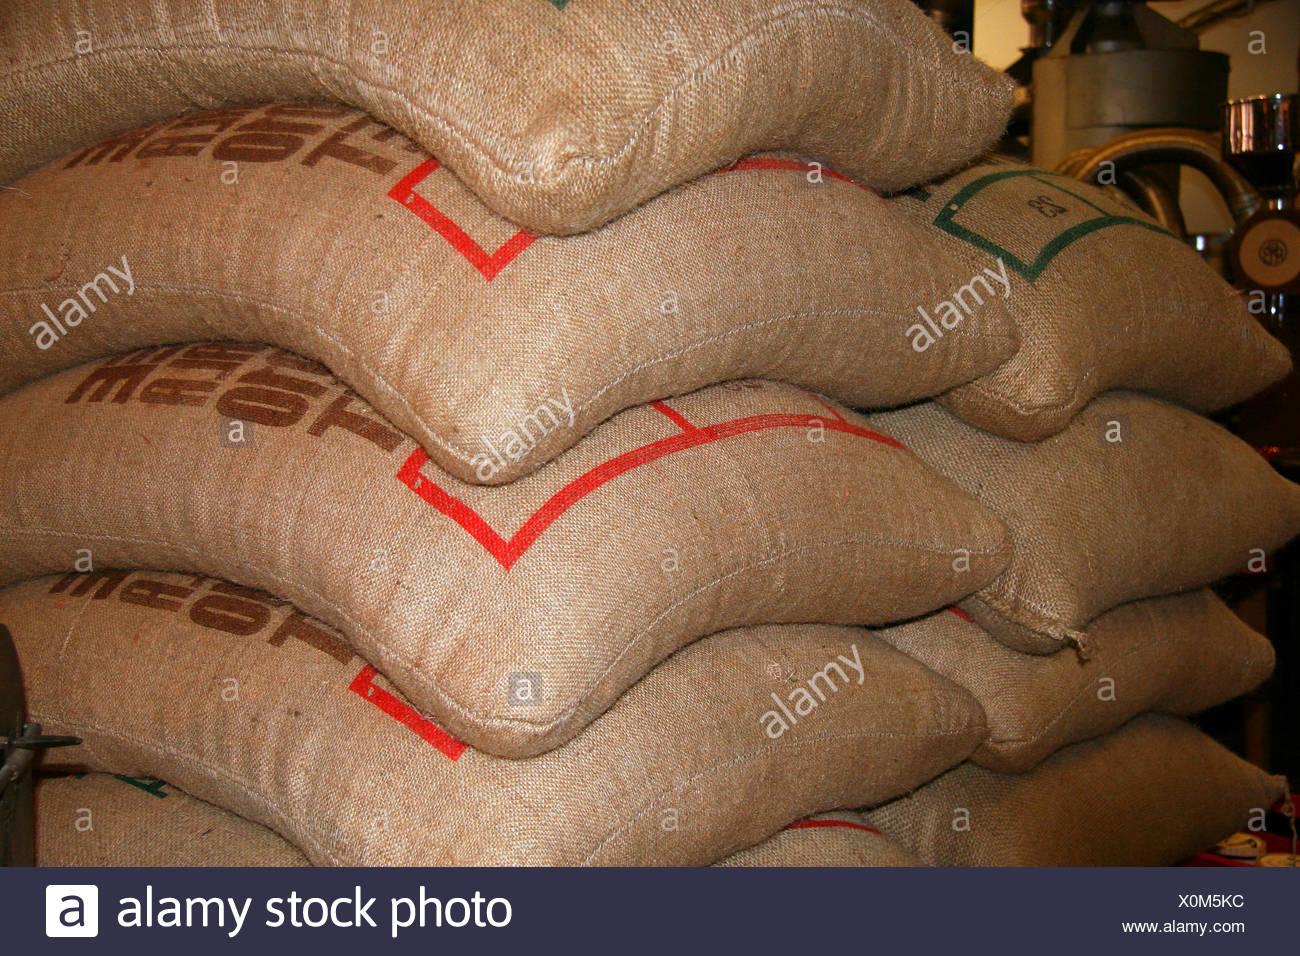 stack,storage,coffee sack - Stock Image